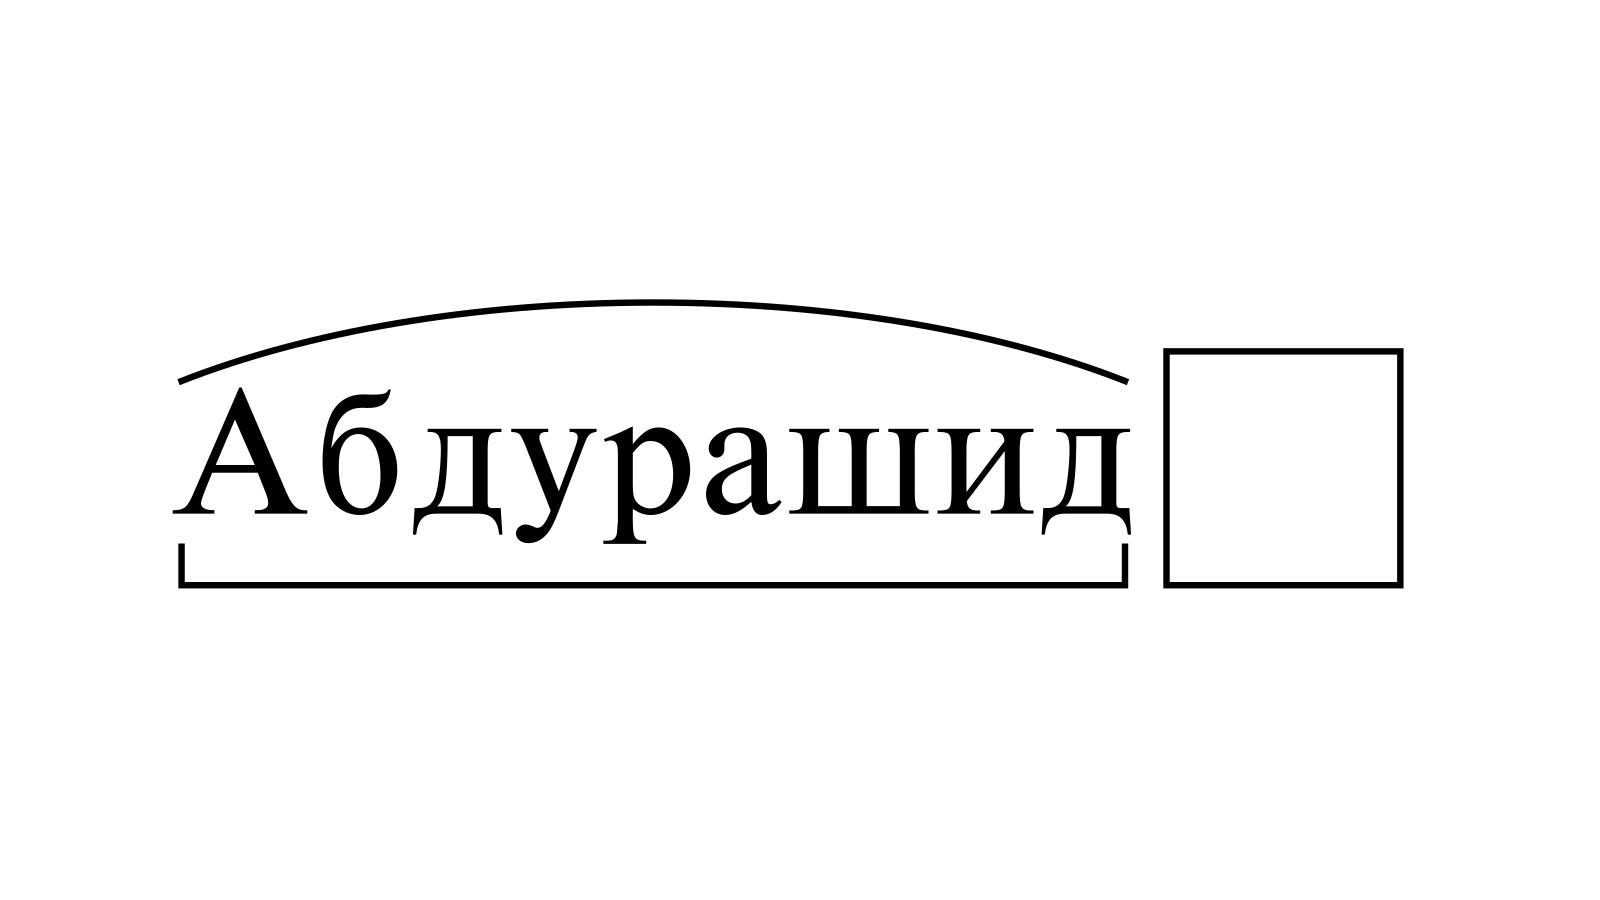 Разбор слова «Абдурашид» по составу